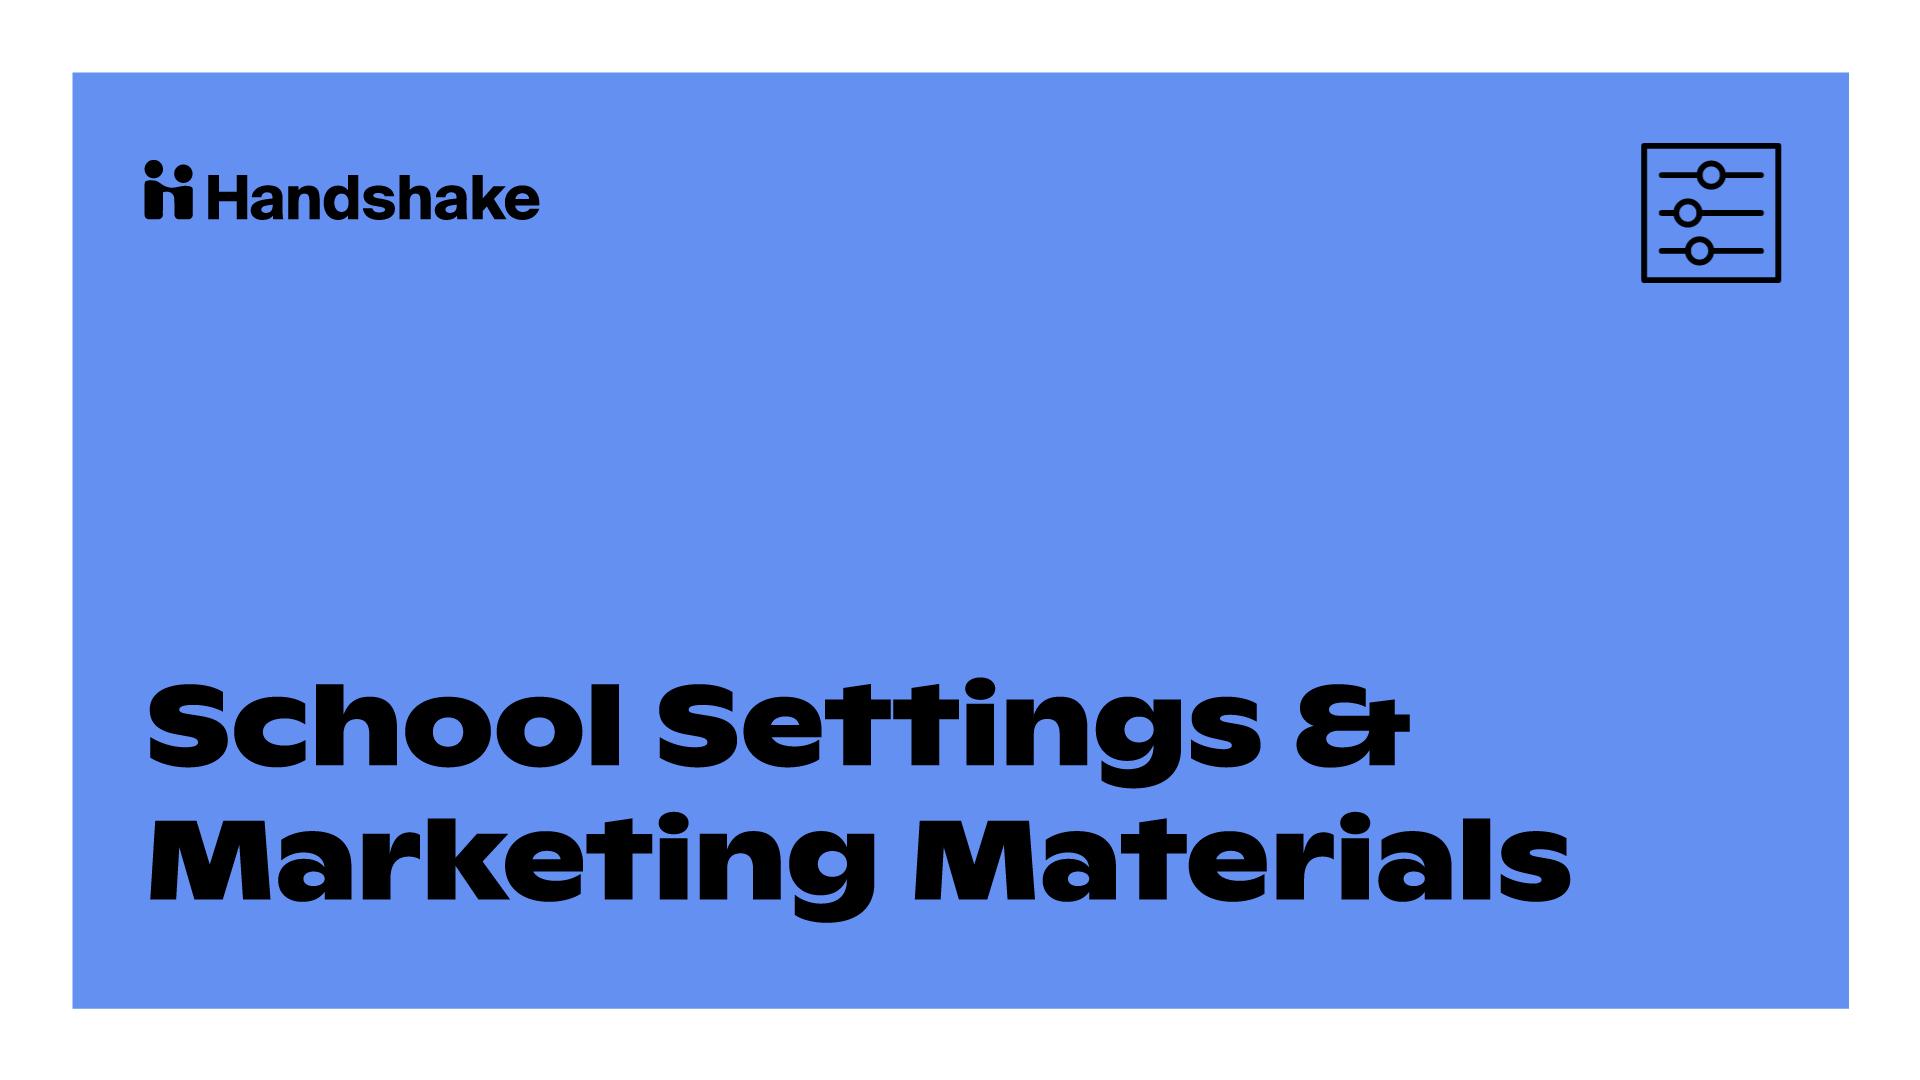 Milestone 3: School Settings & Marketing Materials